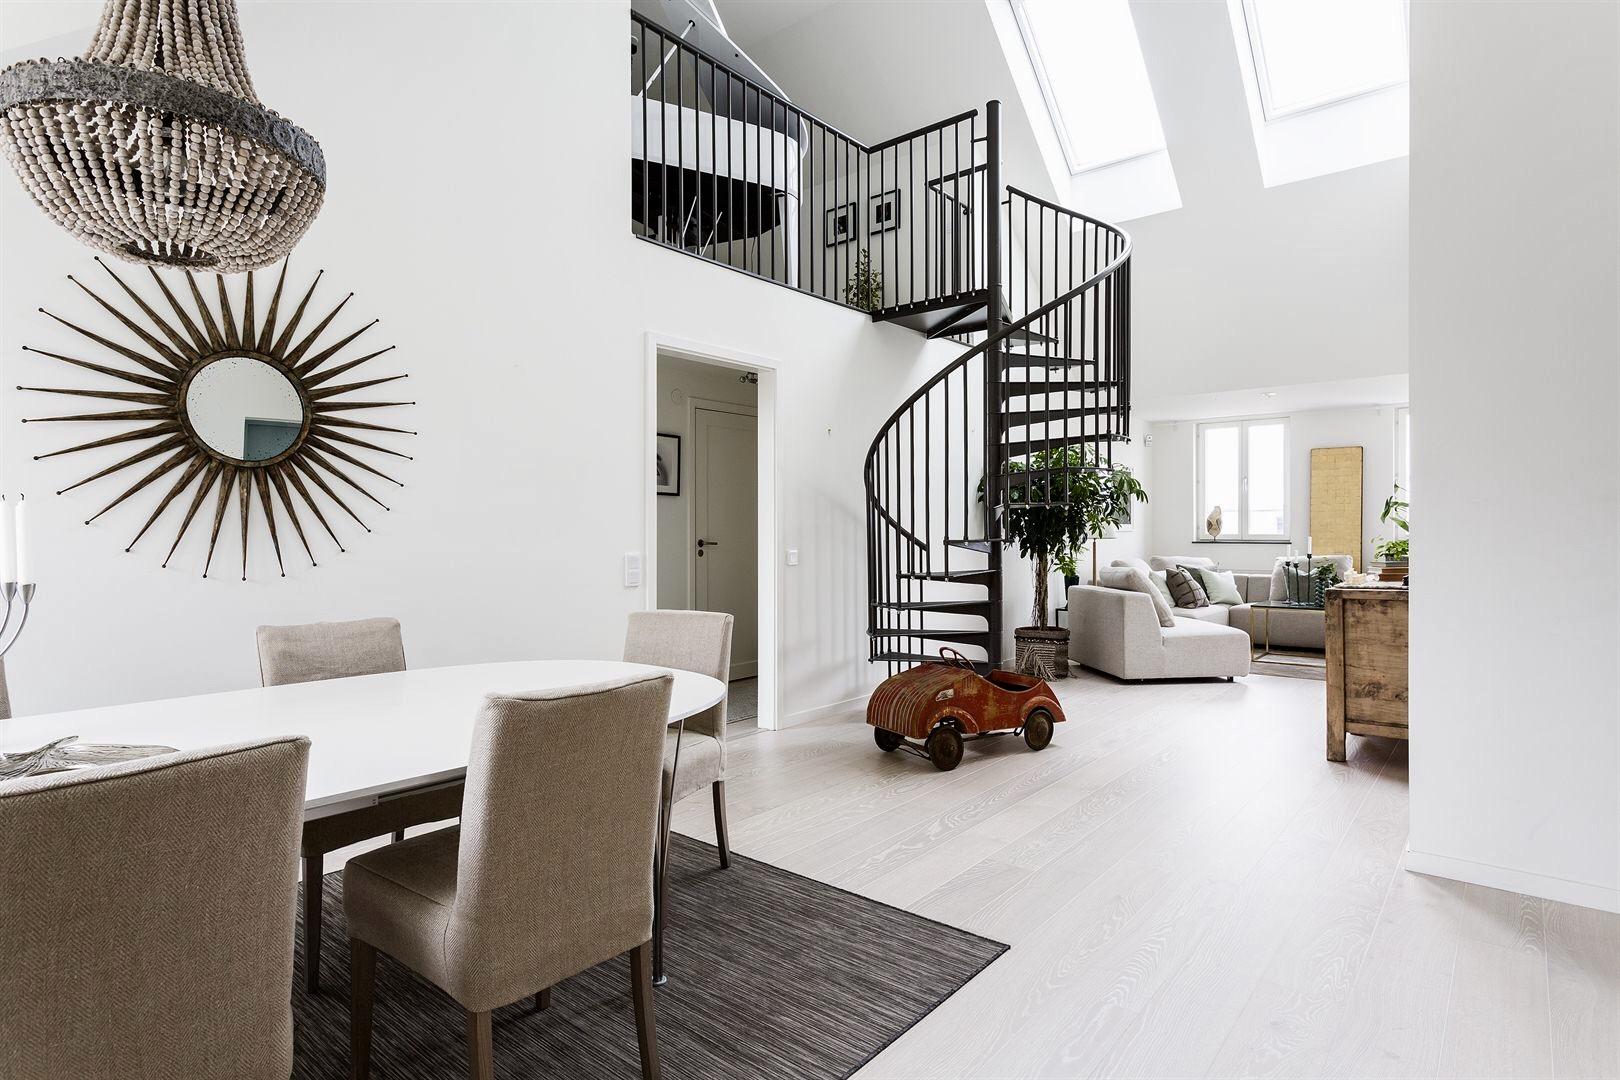 двухуровневая квартира винтовая лестница металл